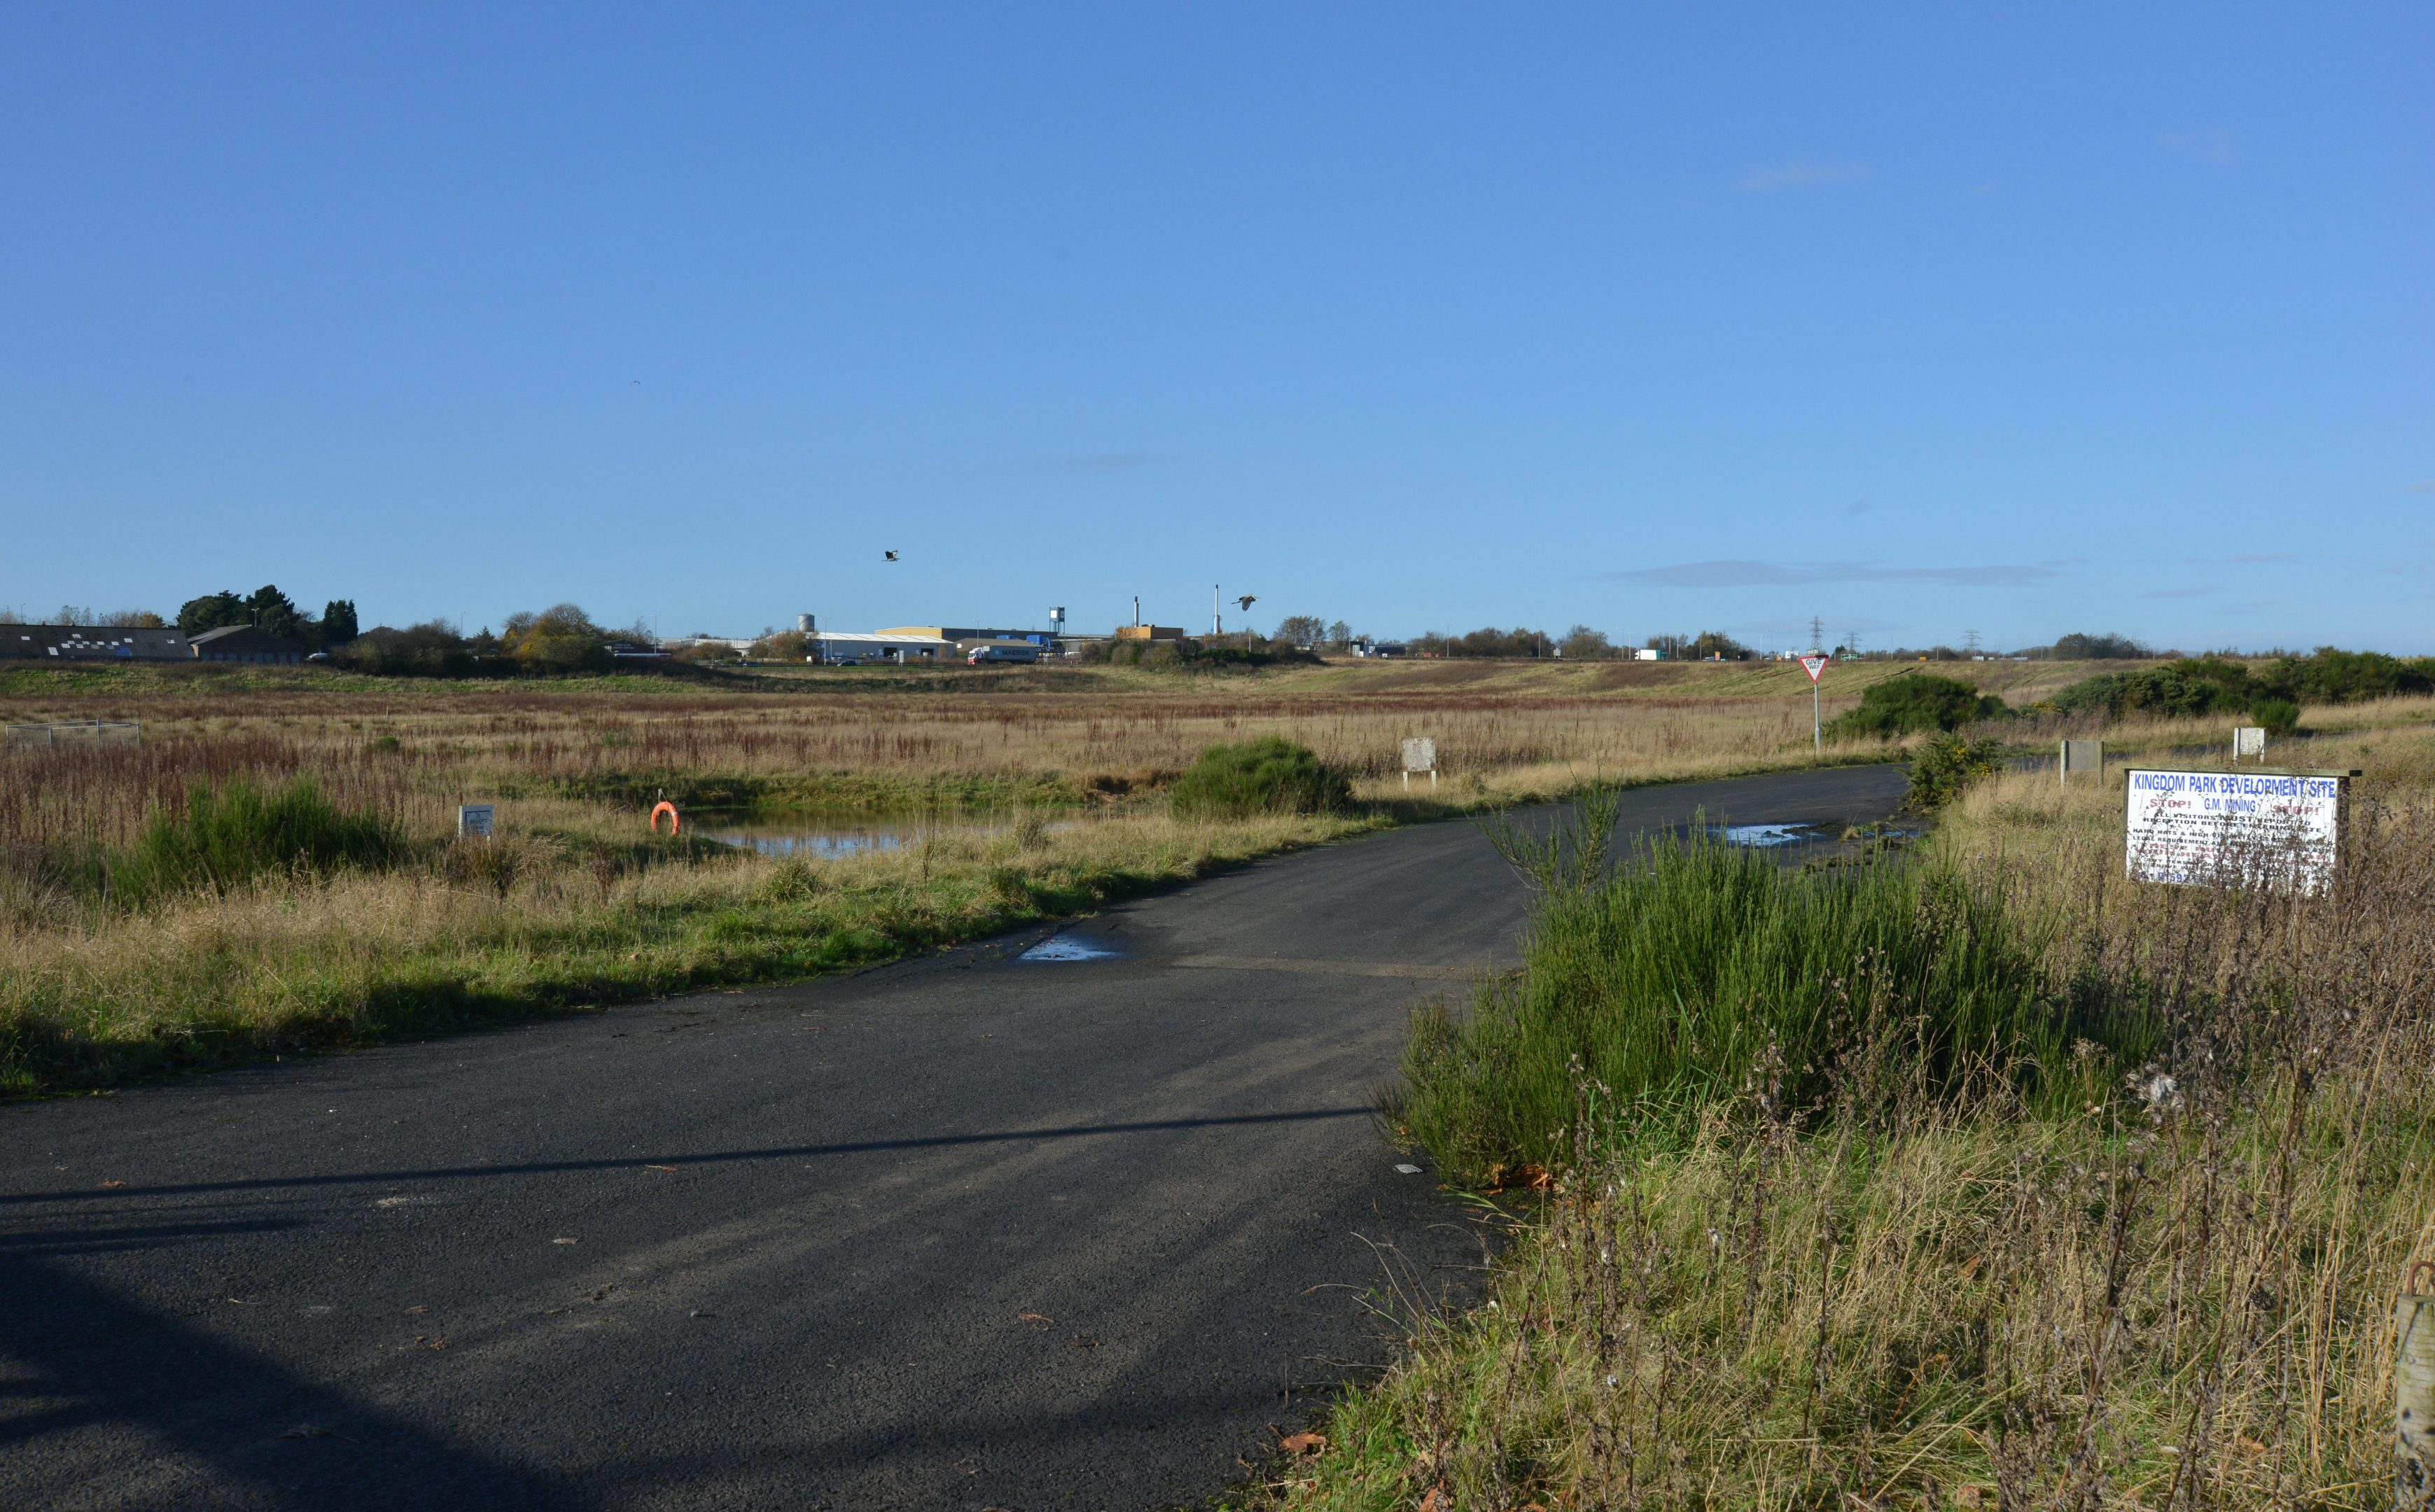 The Kingdom Park site.